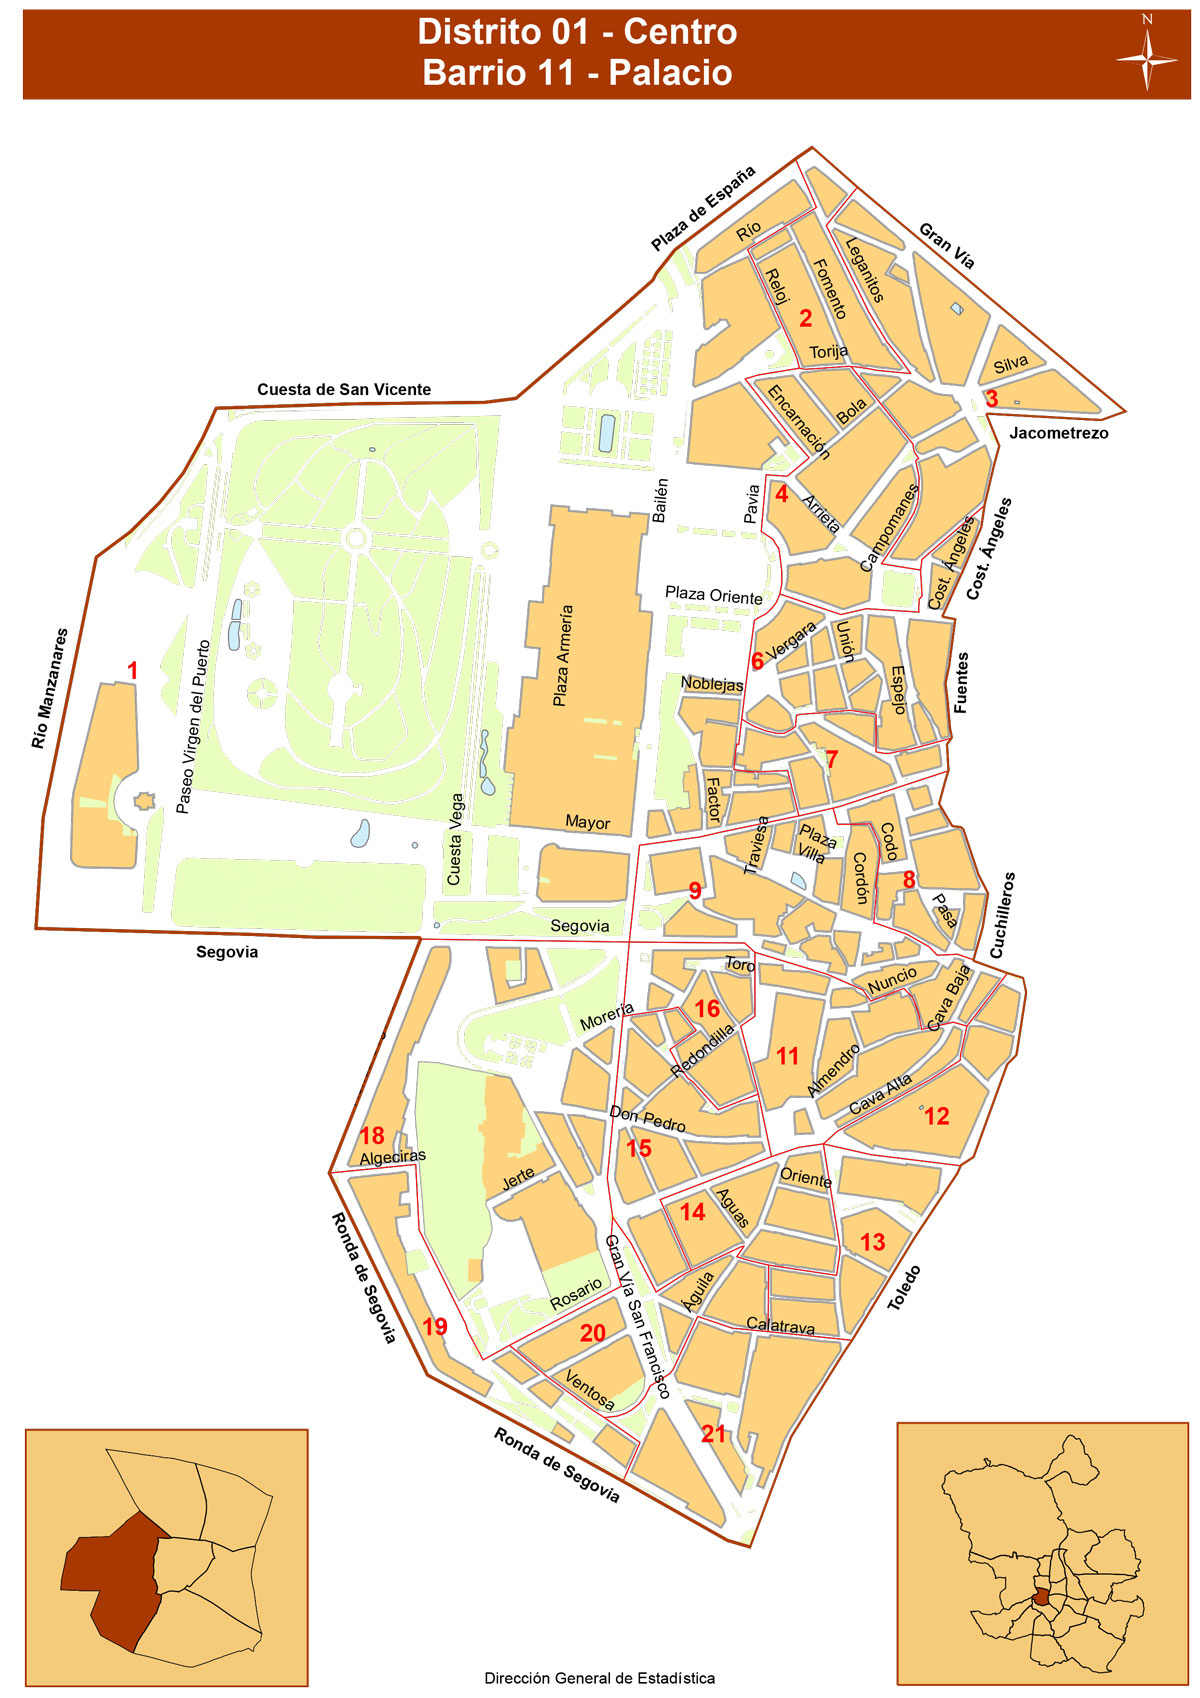 barrio-palacio-distrito-centro-madrid